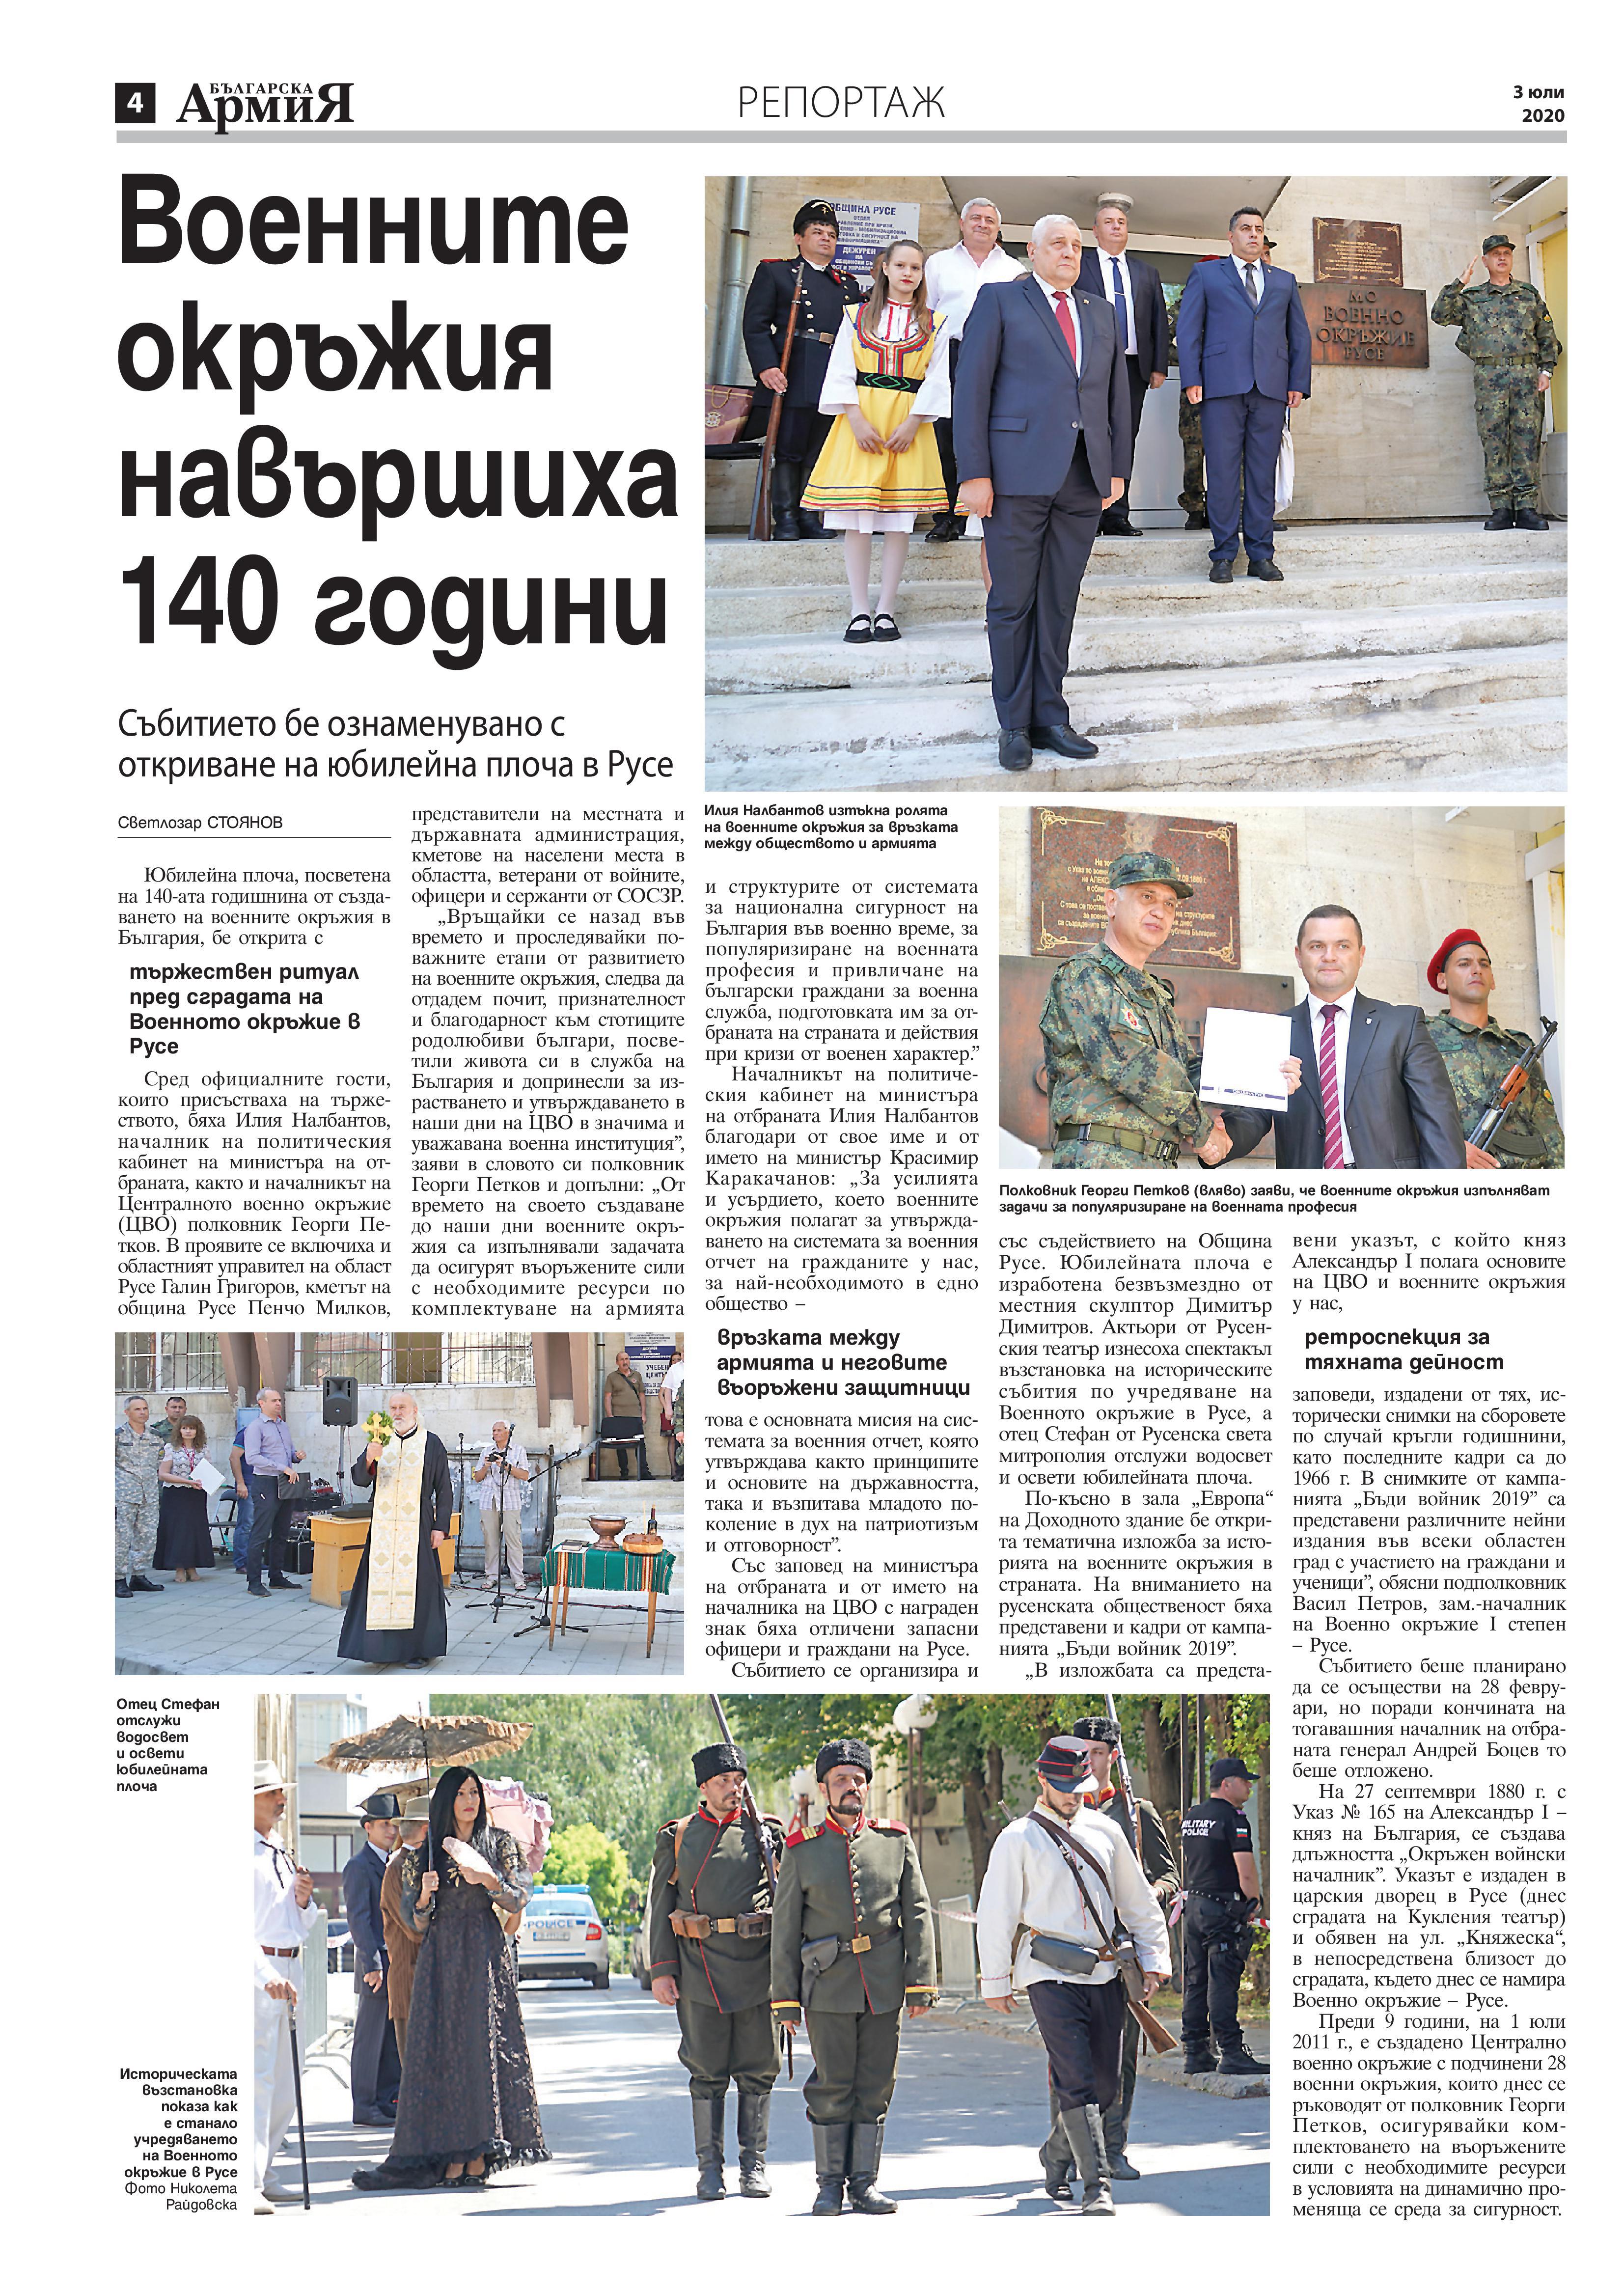 https://www.armymedia.bg/wp-content/uploads/2015/06/04-35.jpg